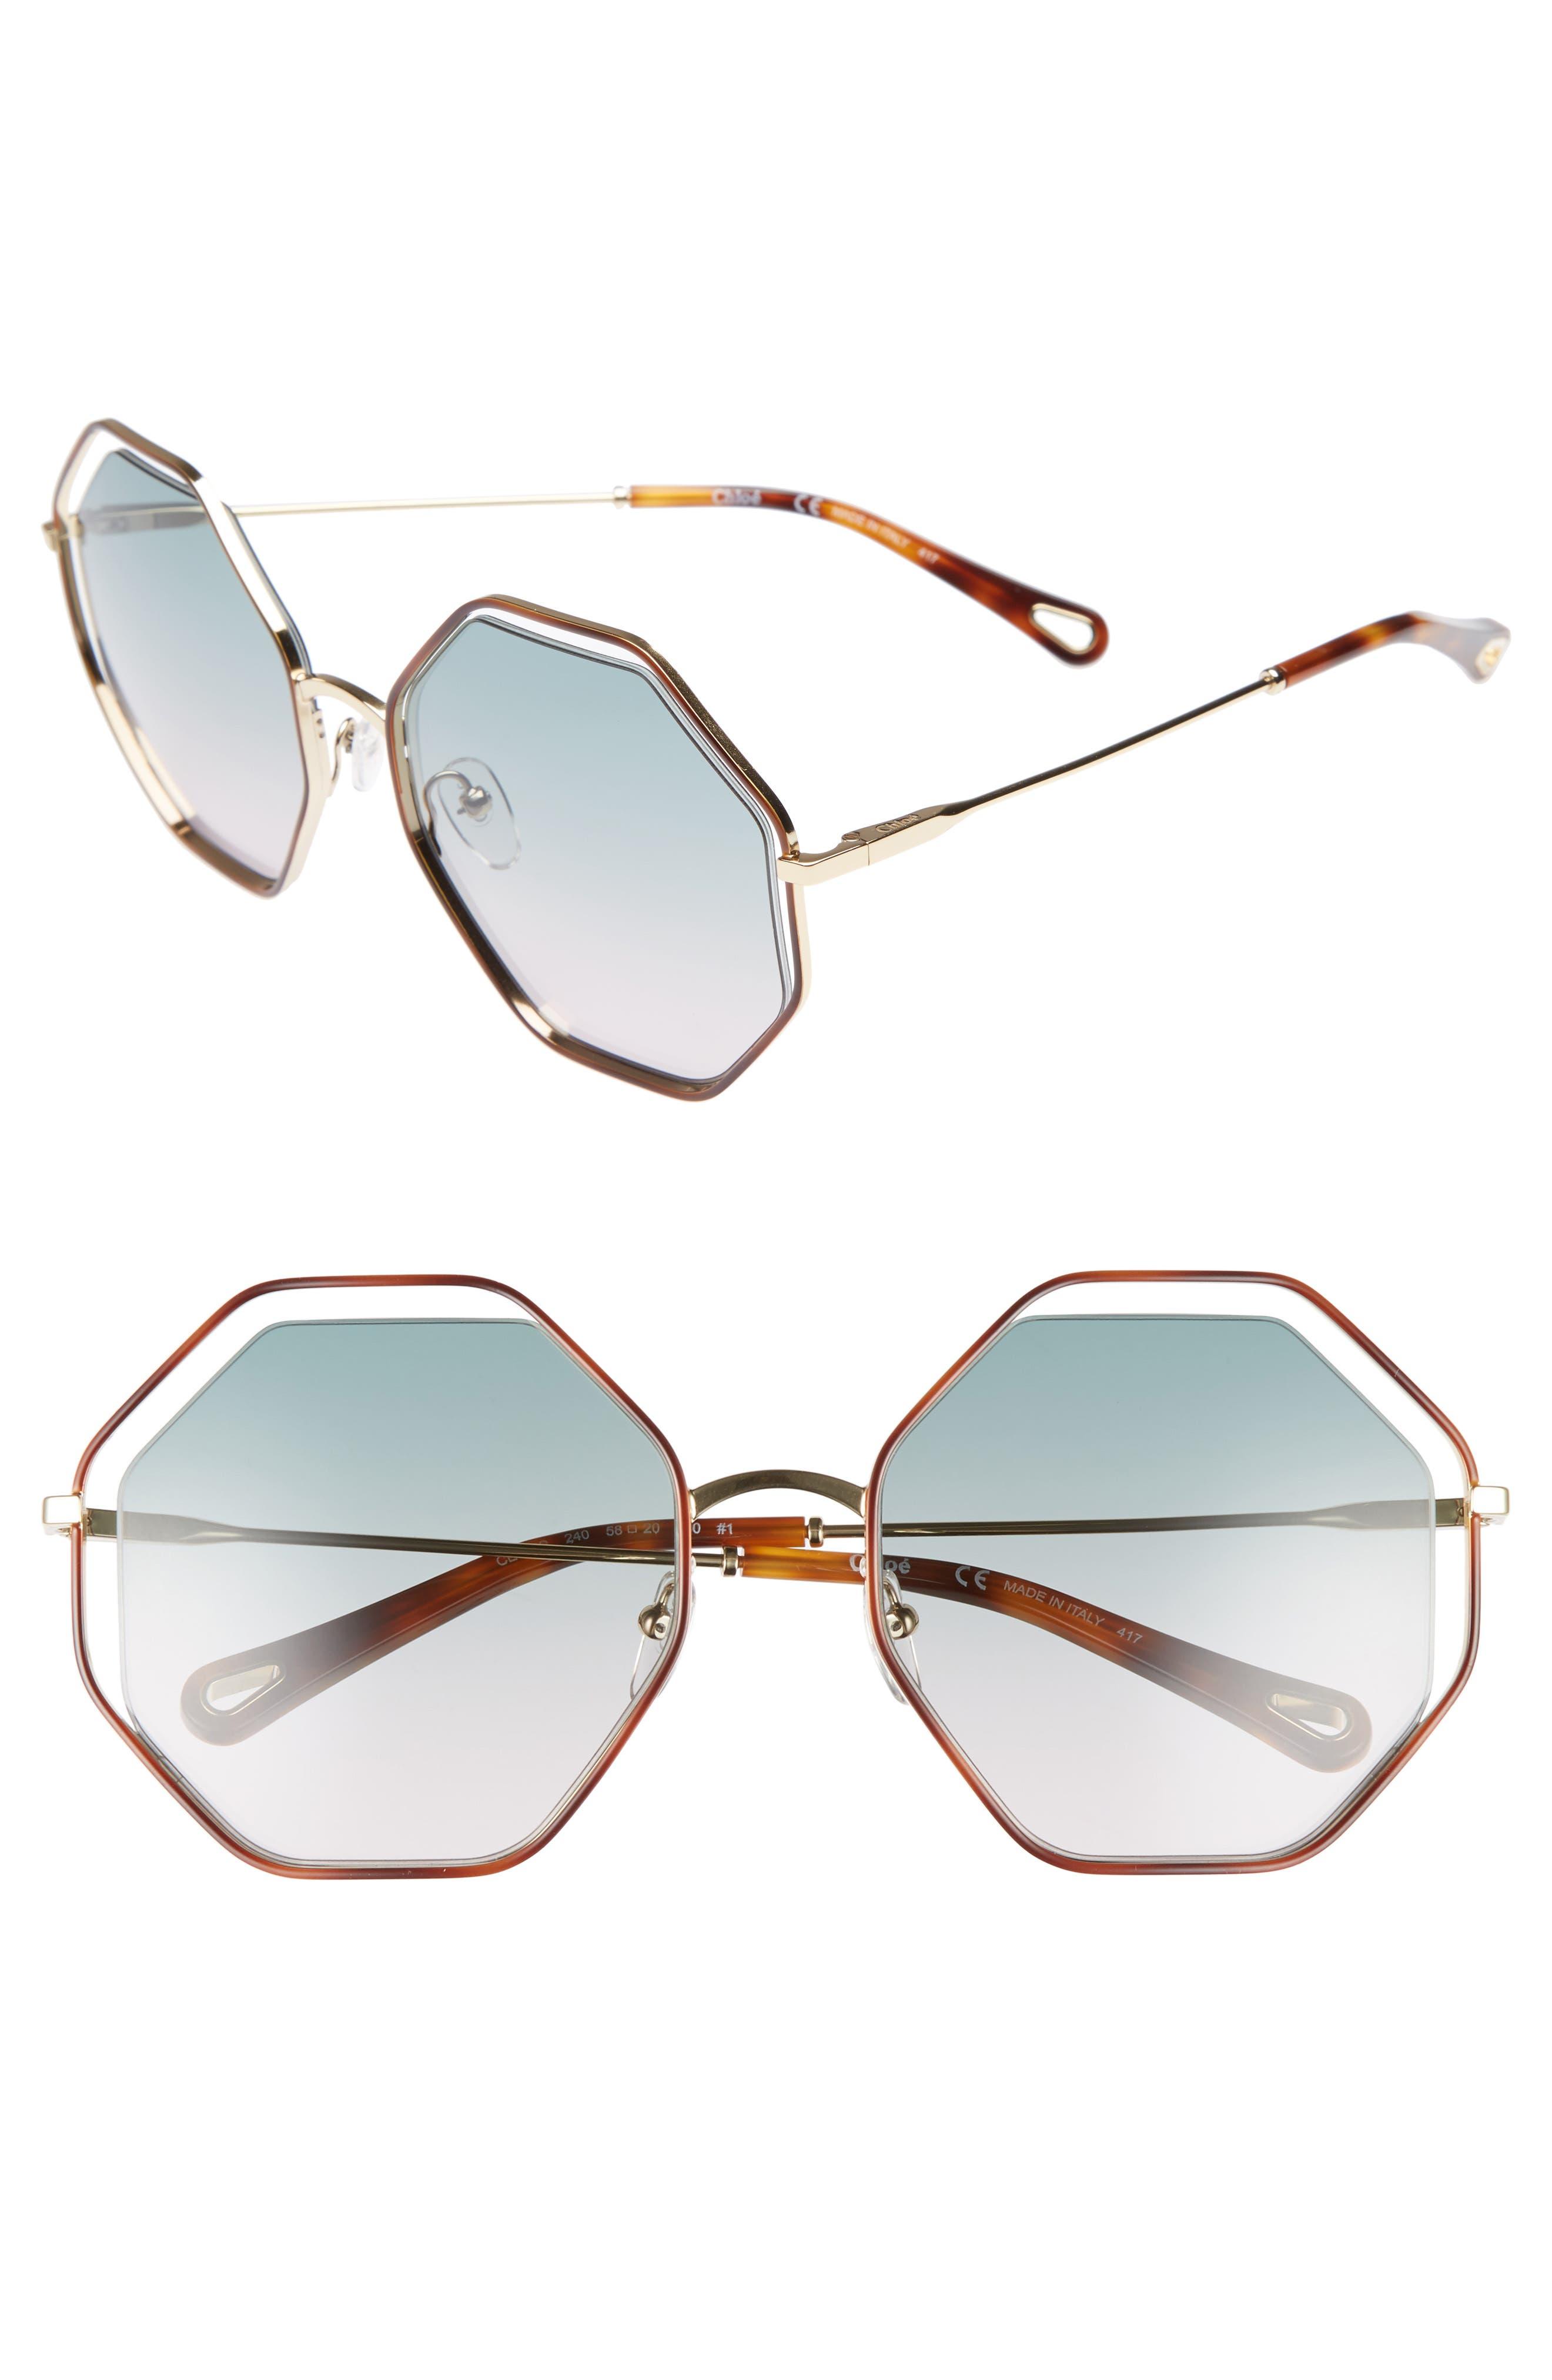 58mm Octagonal Halo Lens Sunglasses,                         Main,                         color, Havana/ Green Rose